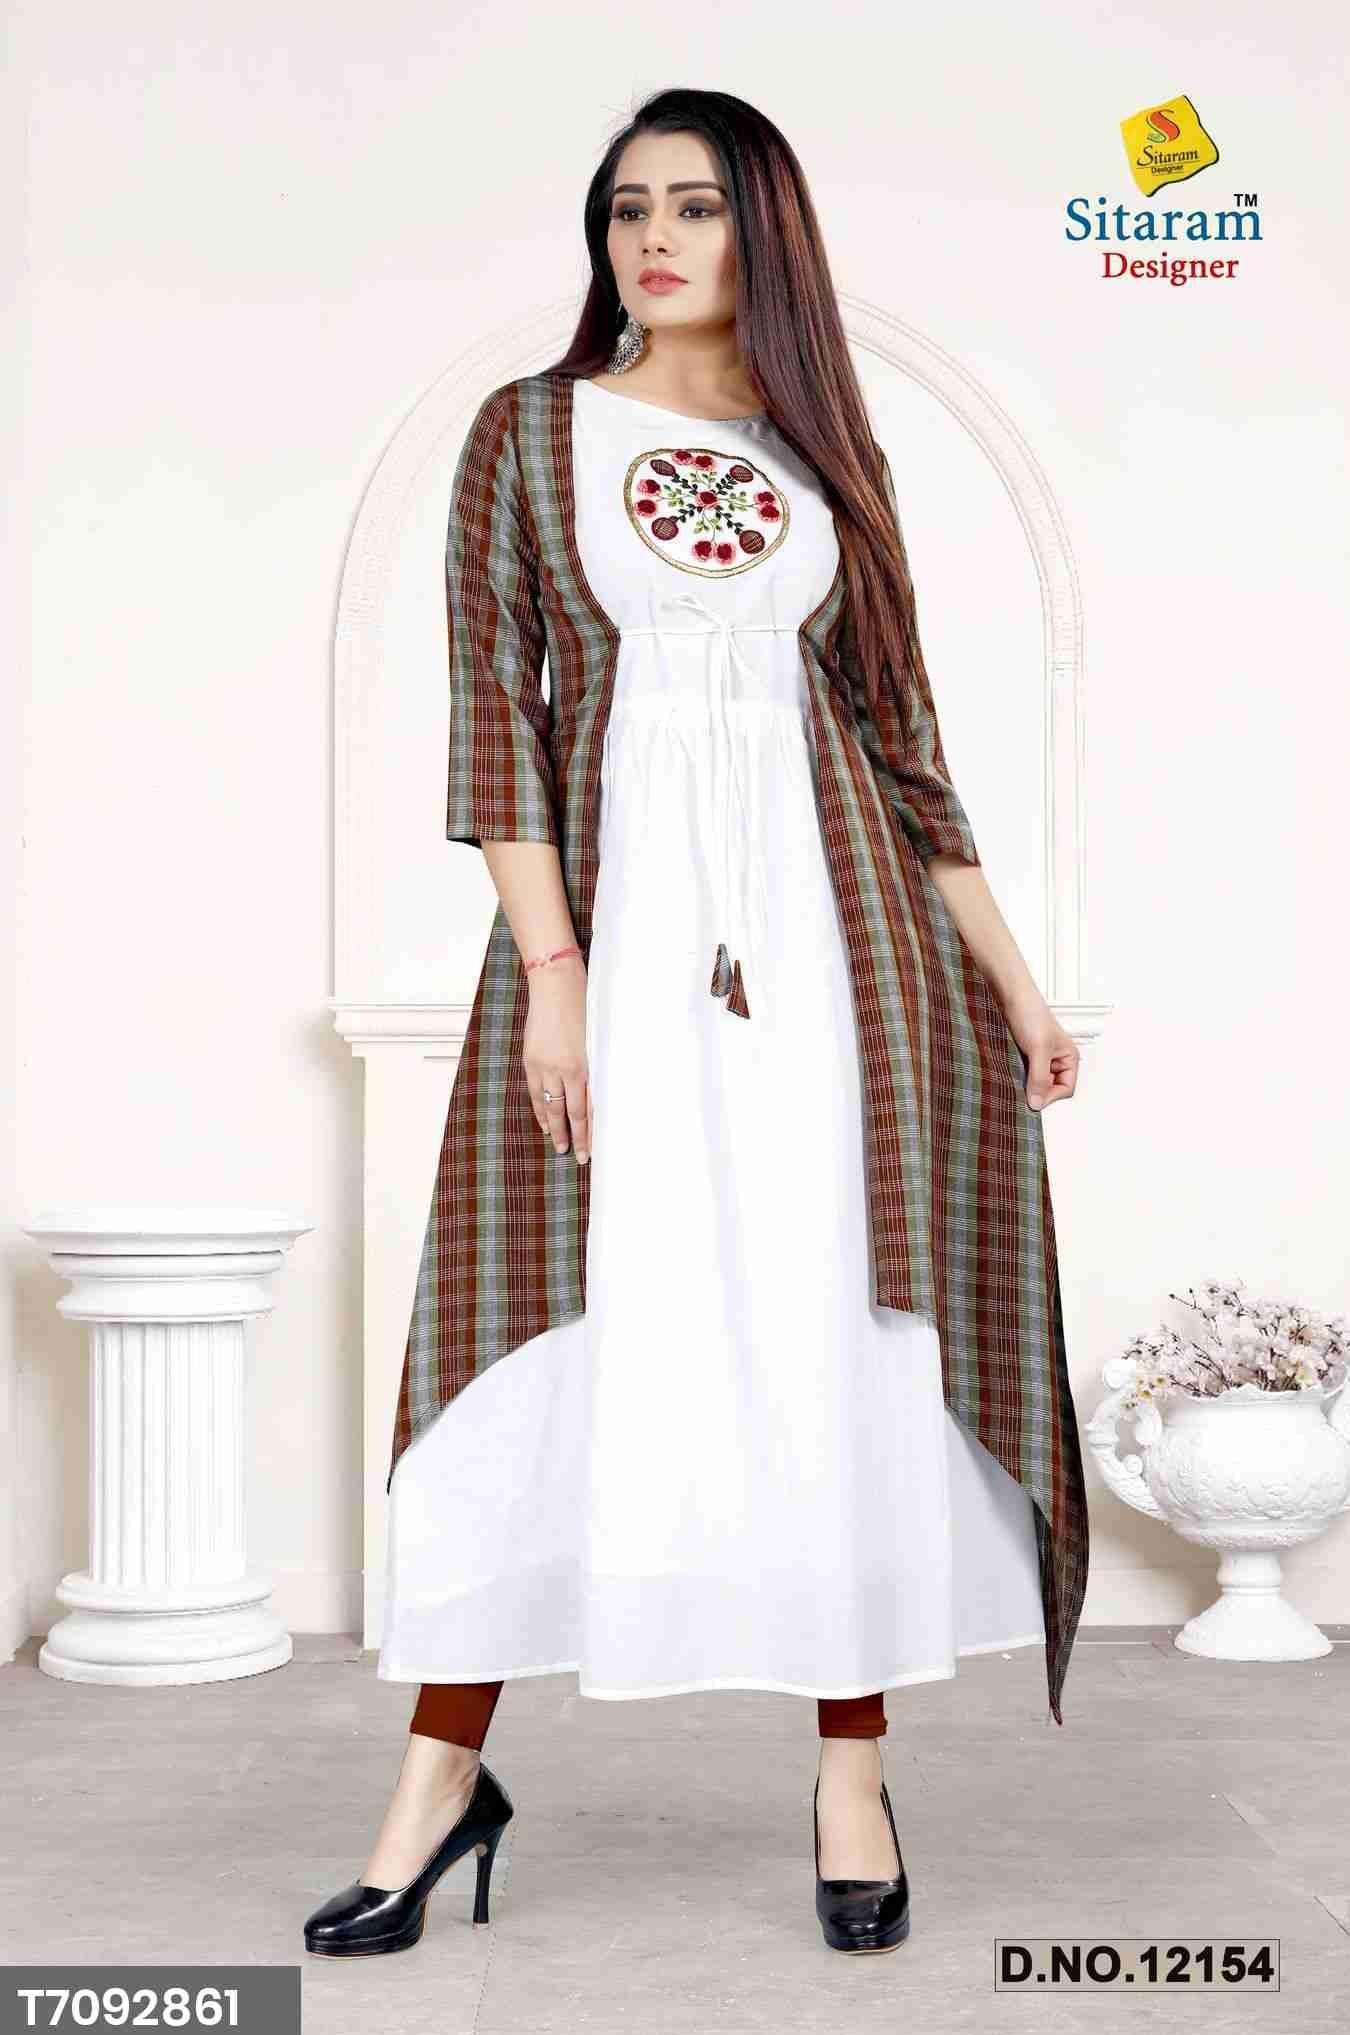 Sitaram Designer Rayon Cotton Primium Kurtis